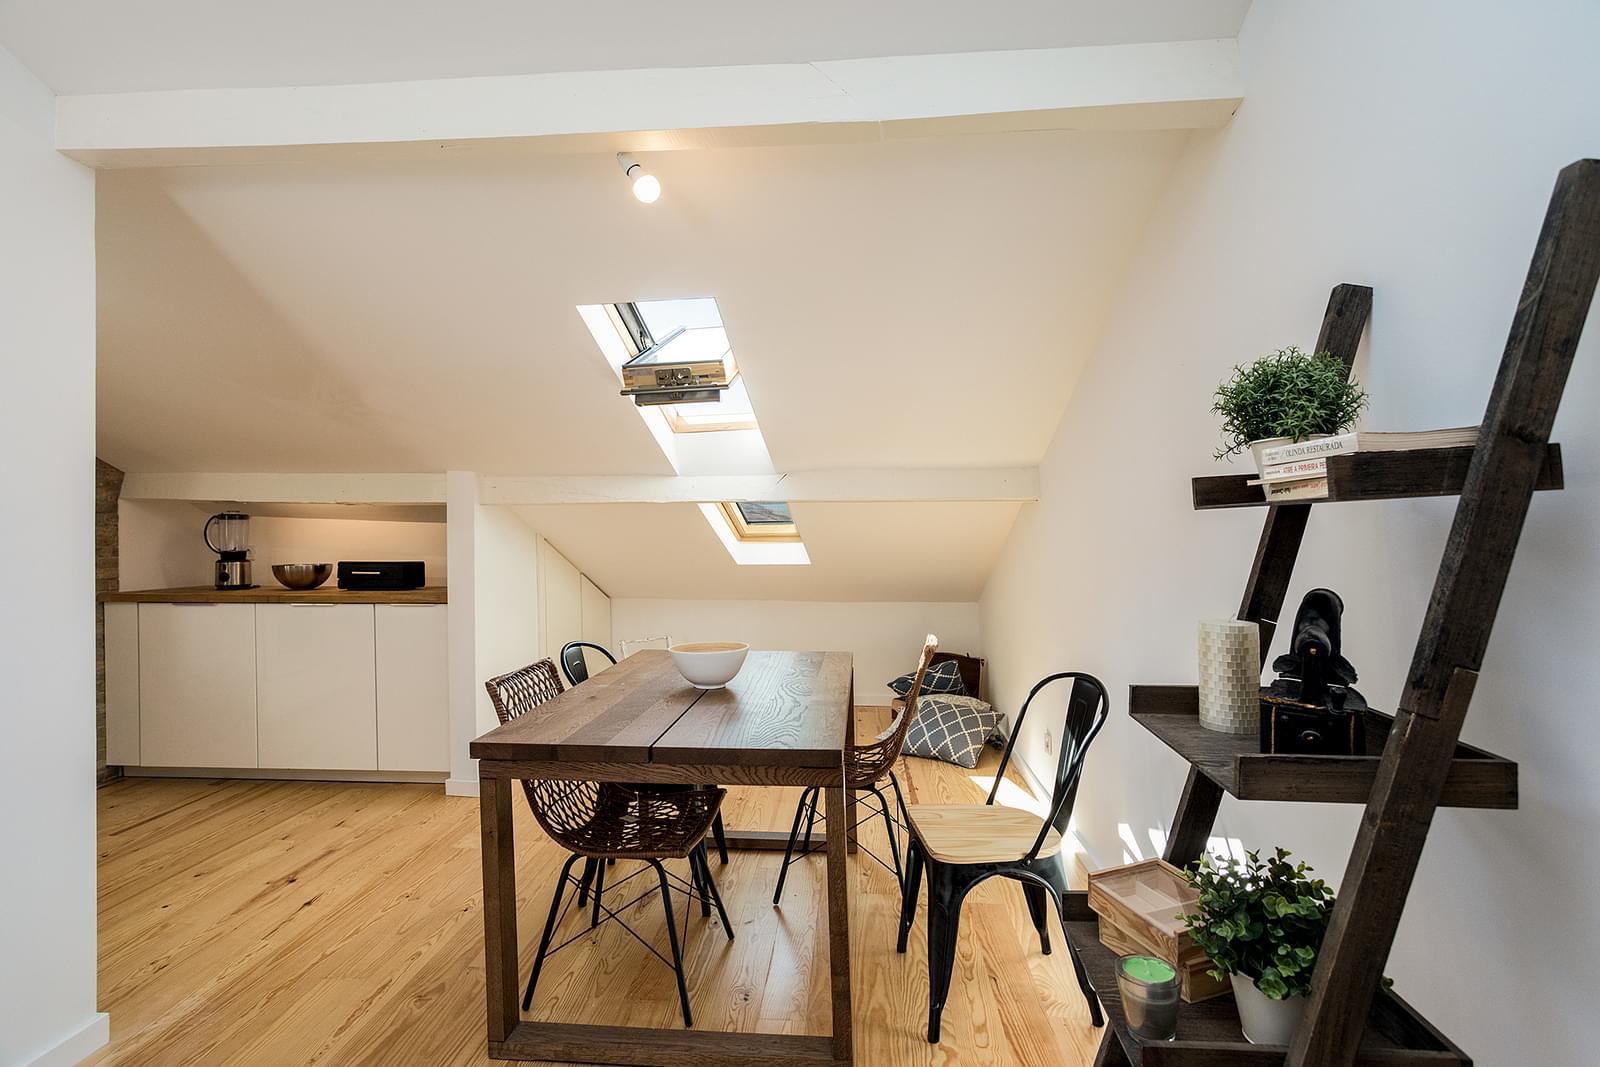 pf17273-apartamento-t2-lisboa-69f3f555-1f6b-4a9f-9733-0d1d856b58d1